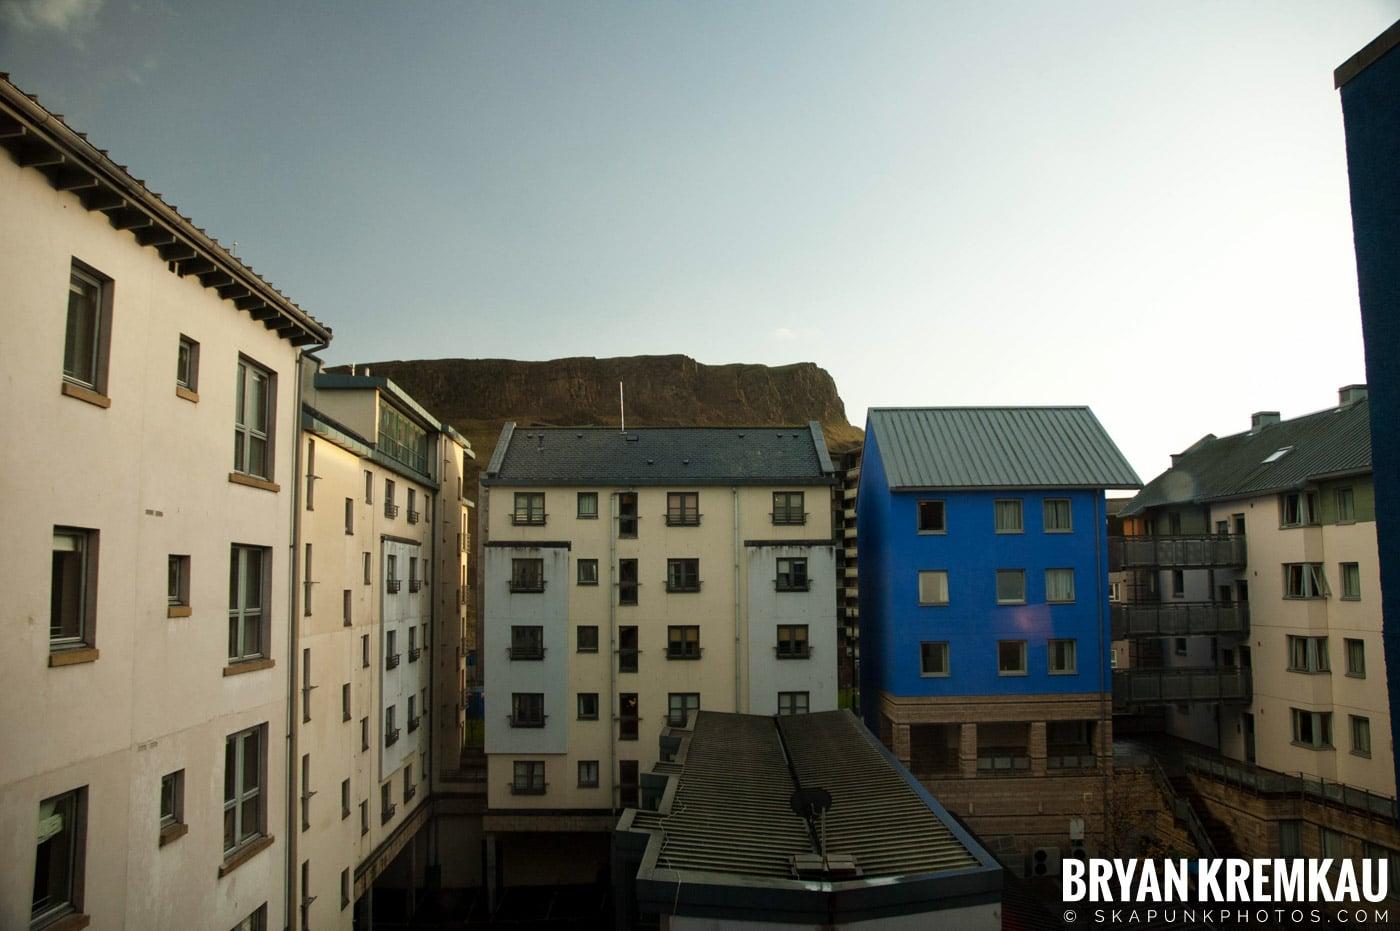 Edinburgh, Scotland - Day 1 - 12.12.06 (24)